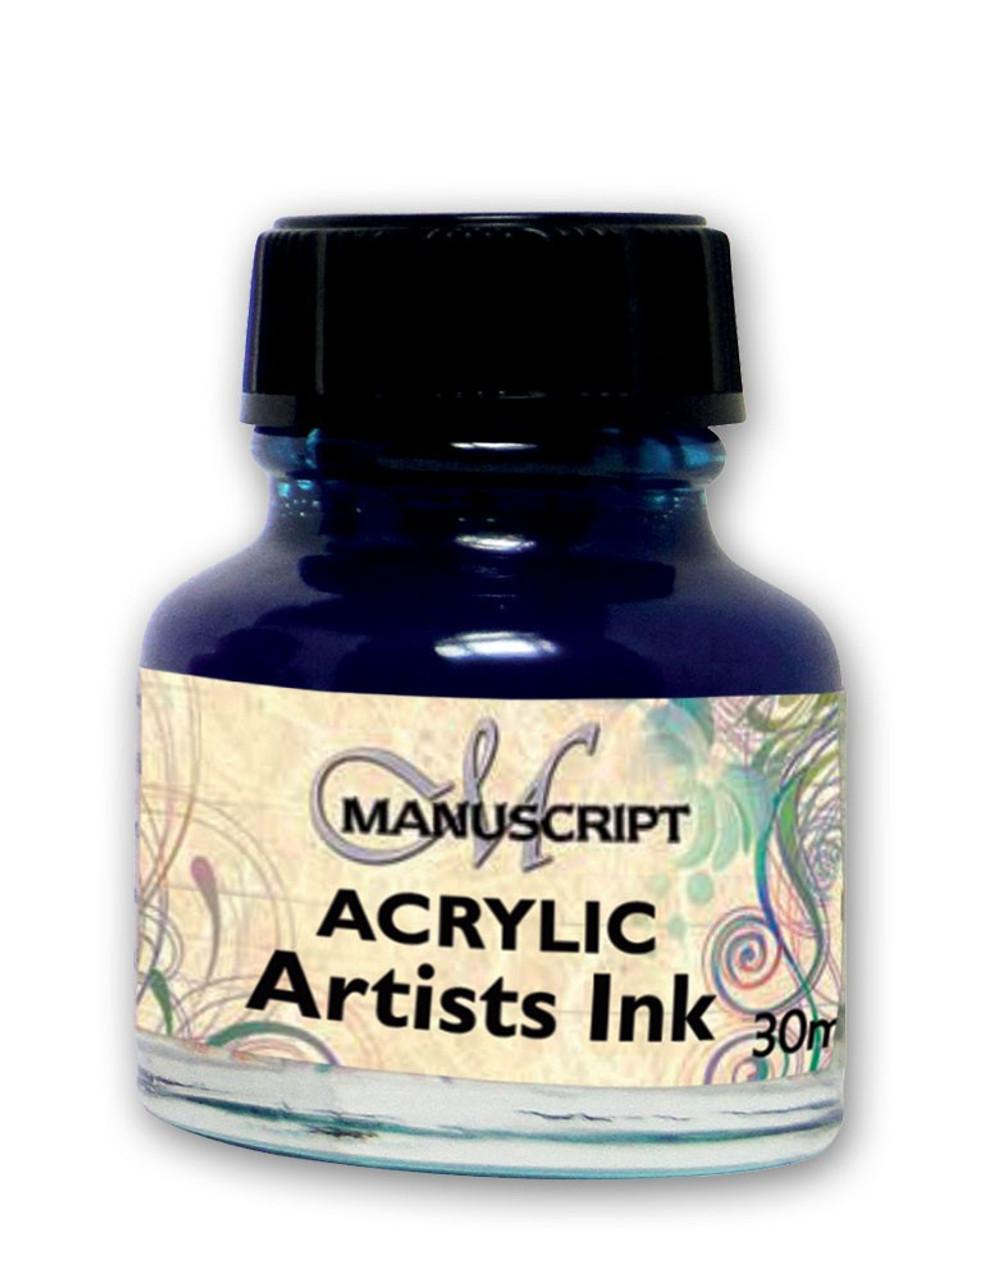 Manuscript 30ml Ocean Blue Artists Acrylic Ink Bottle